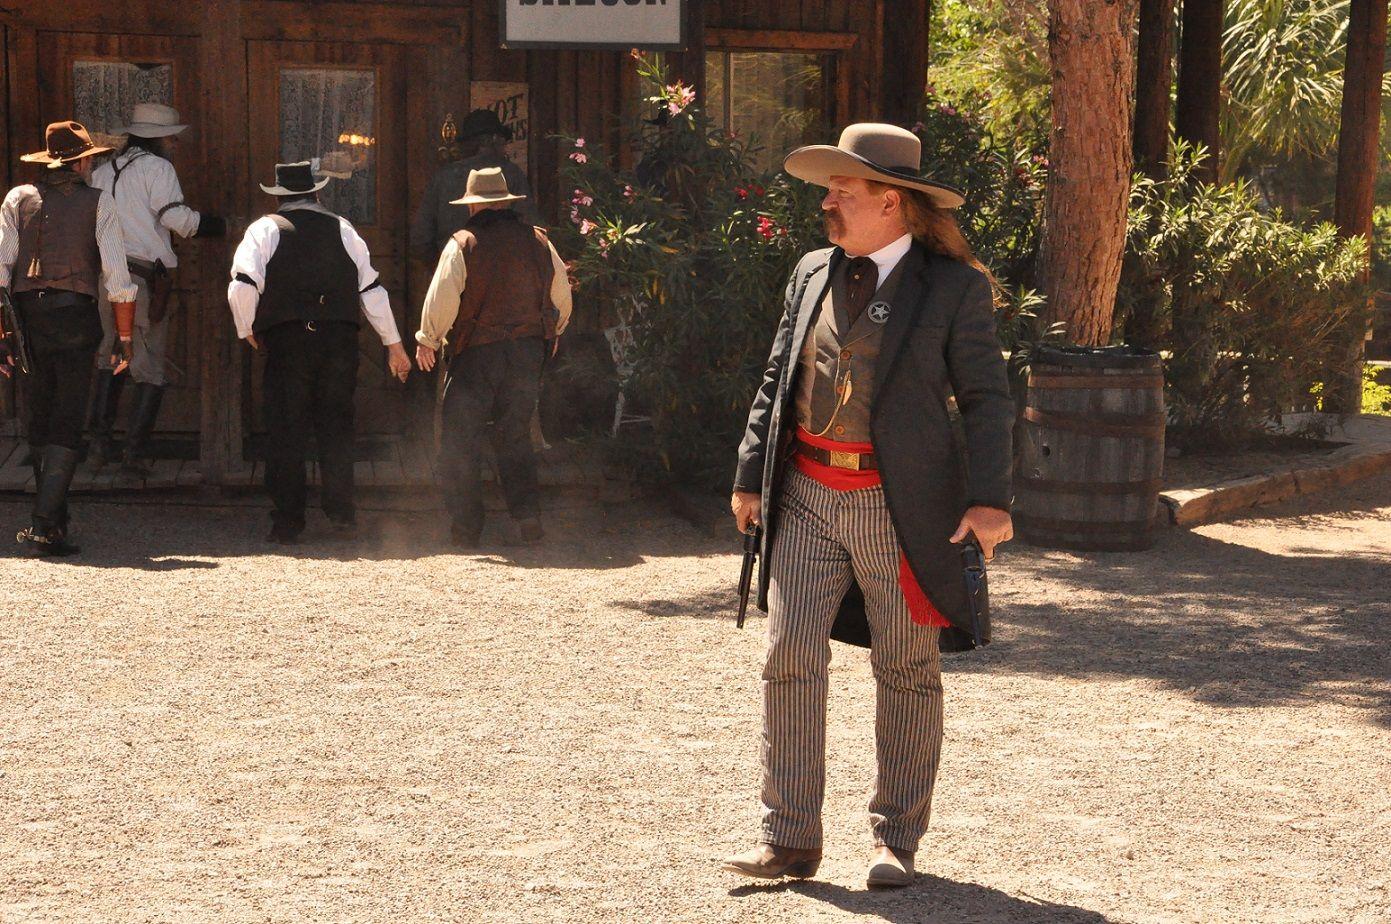 Arizonagunfighters.com - Wild Bill Hickok show